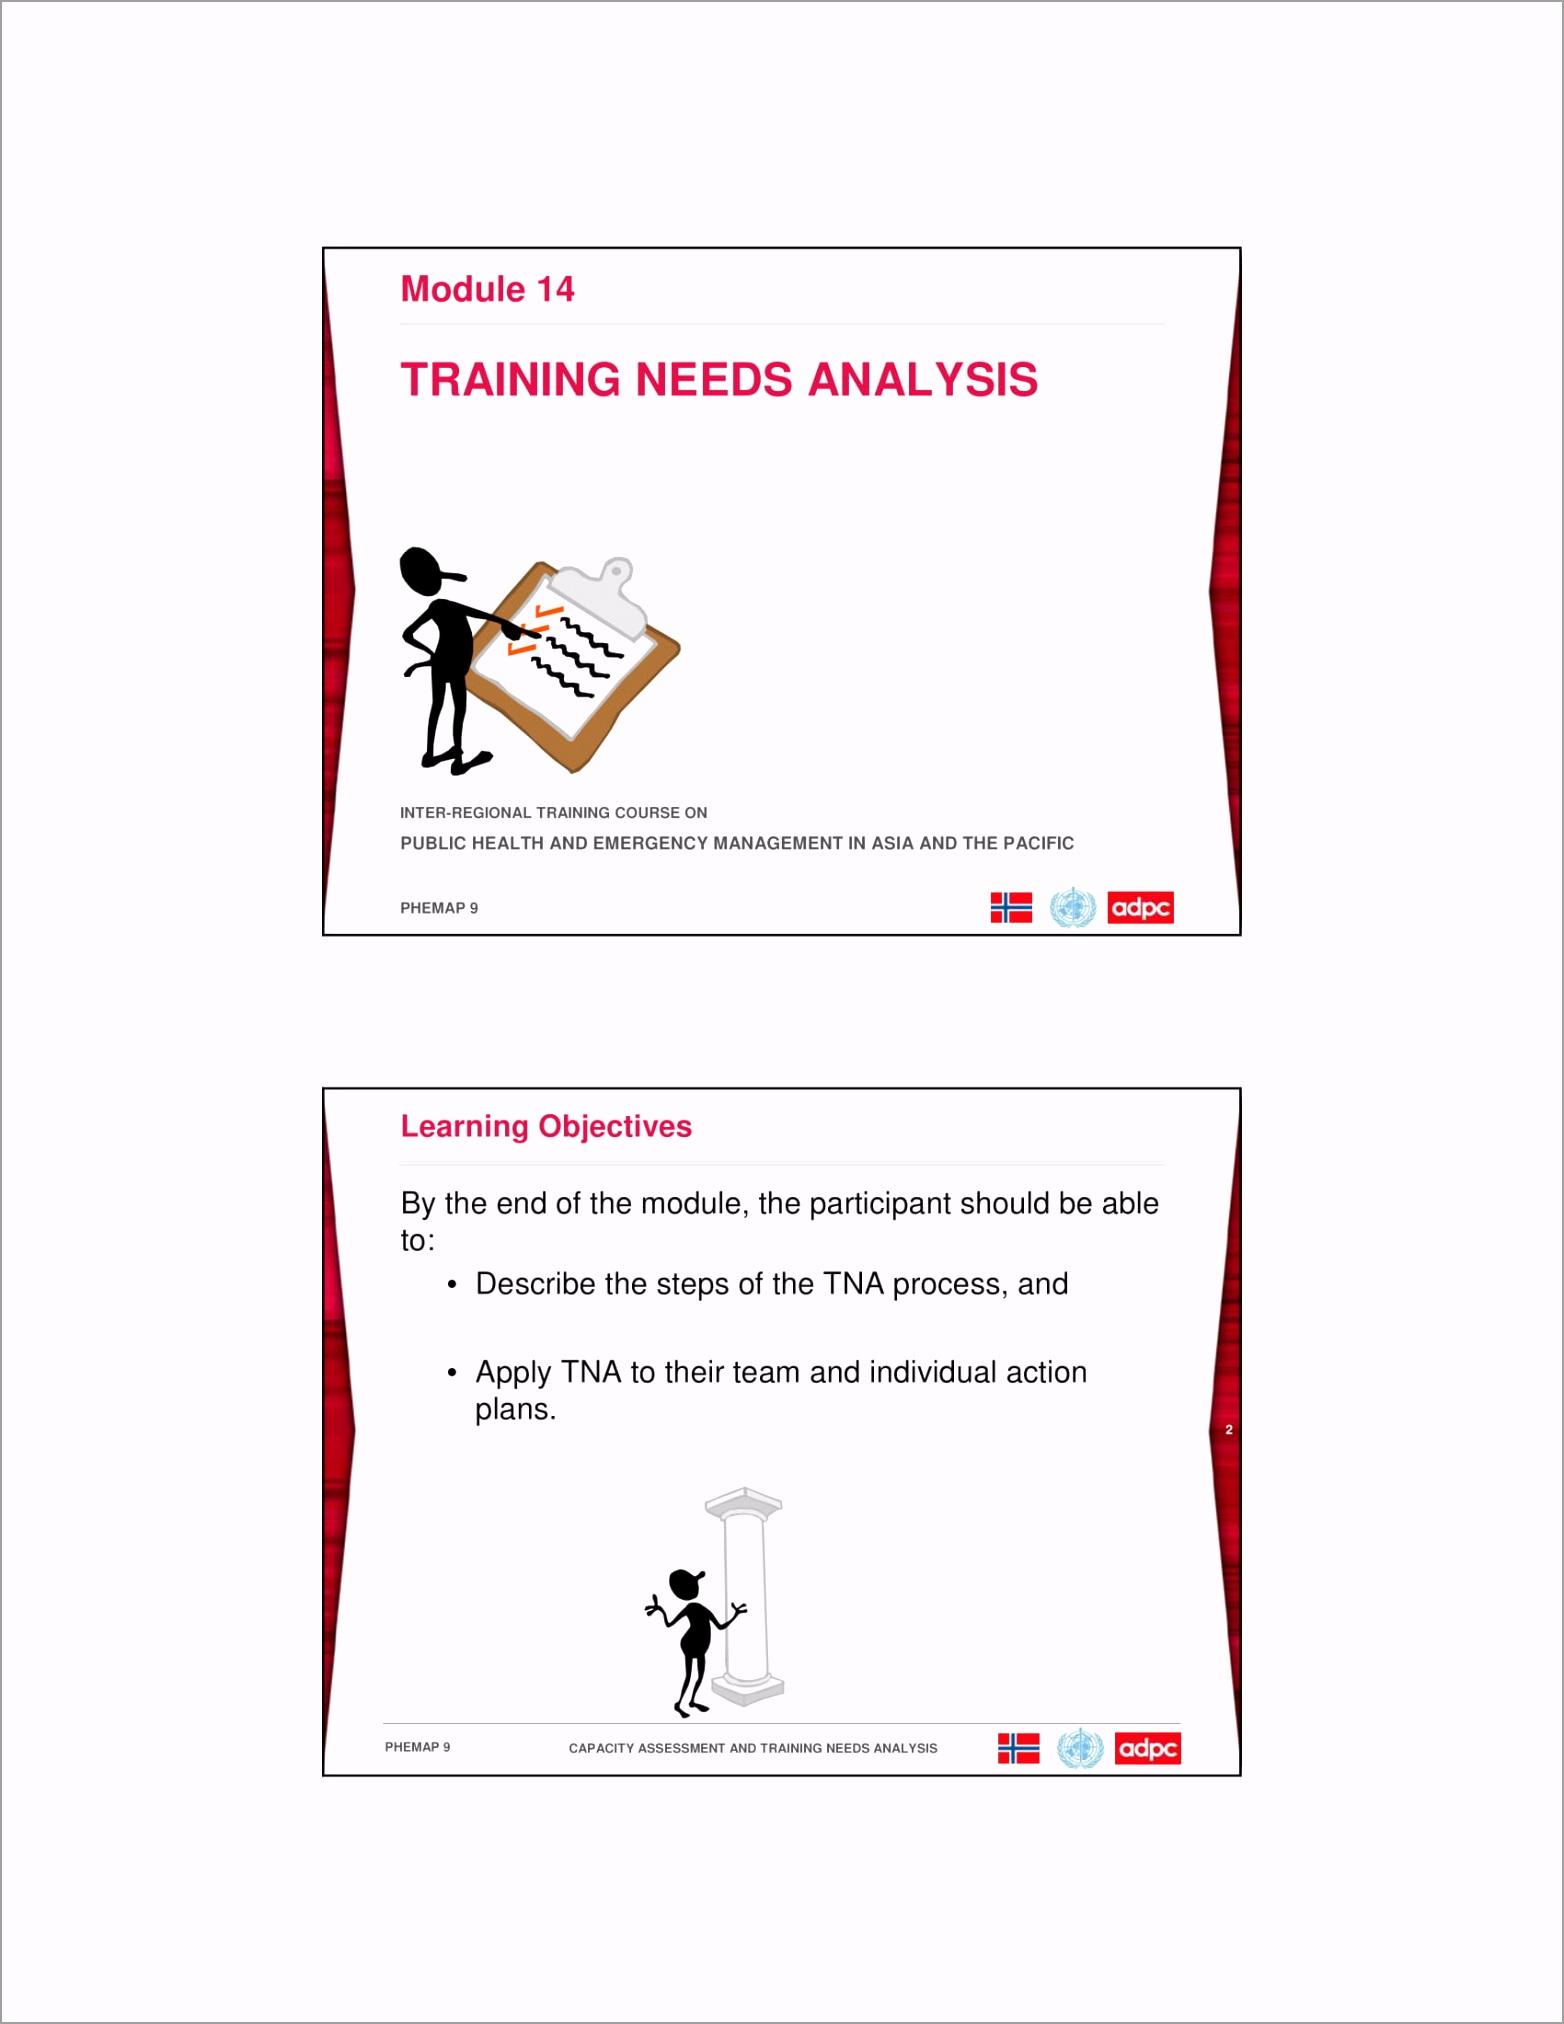 Training Gap and Needs Analysis Module Example 01 eeeoz